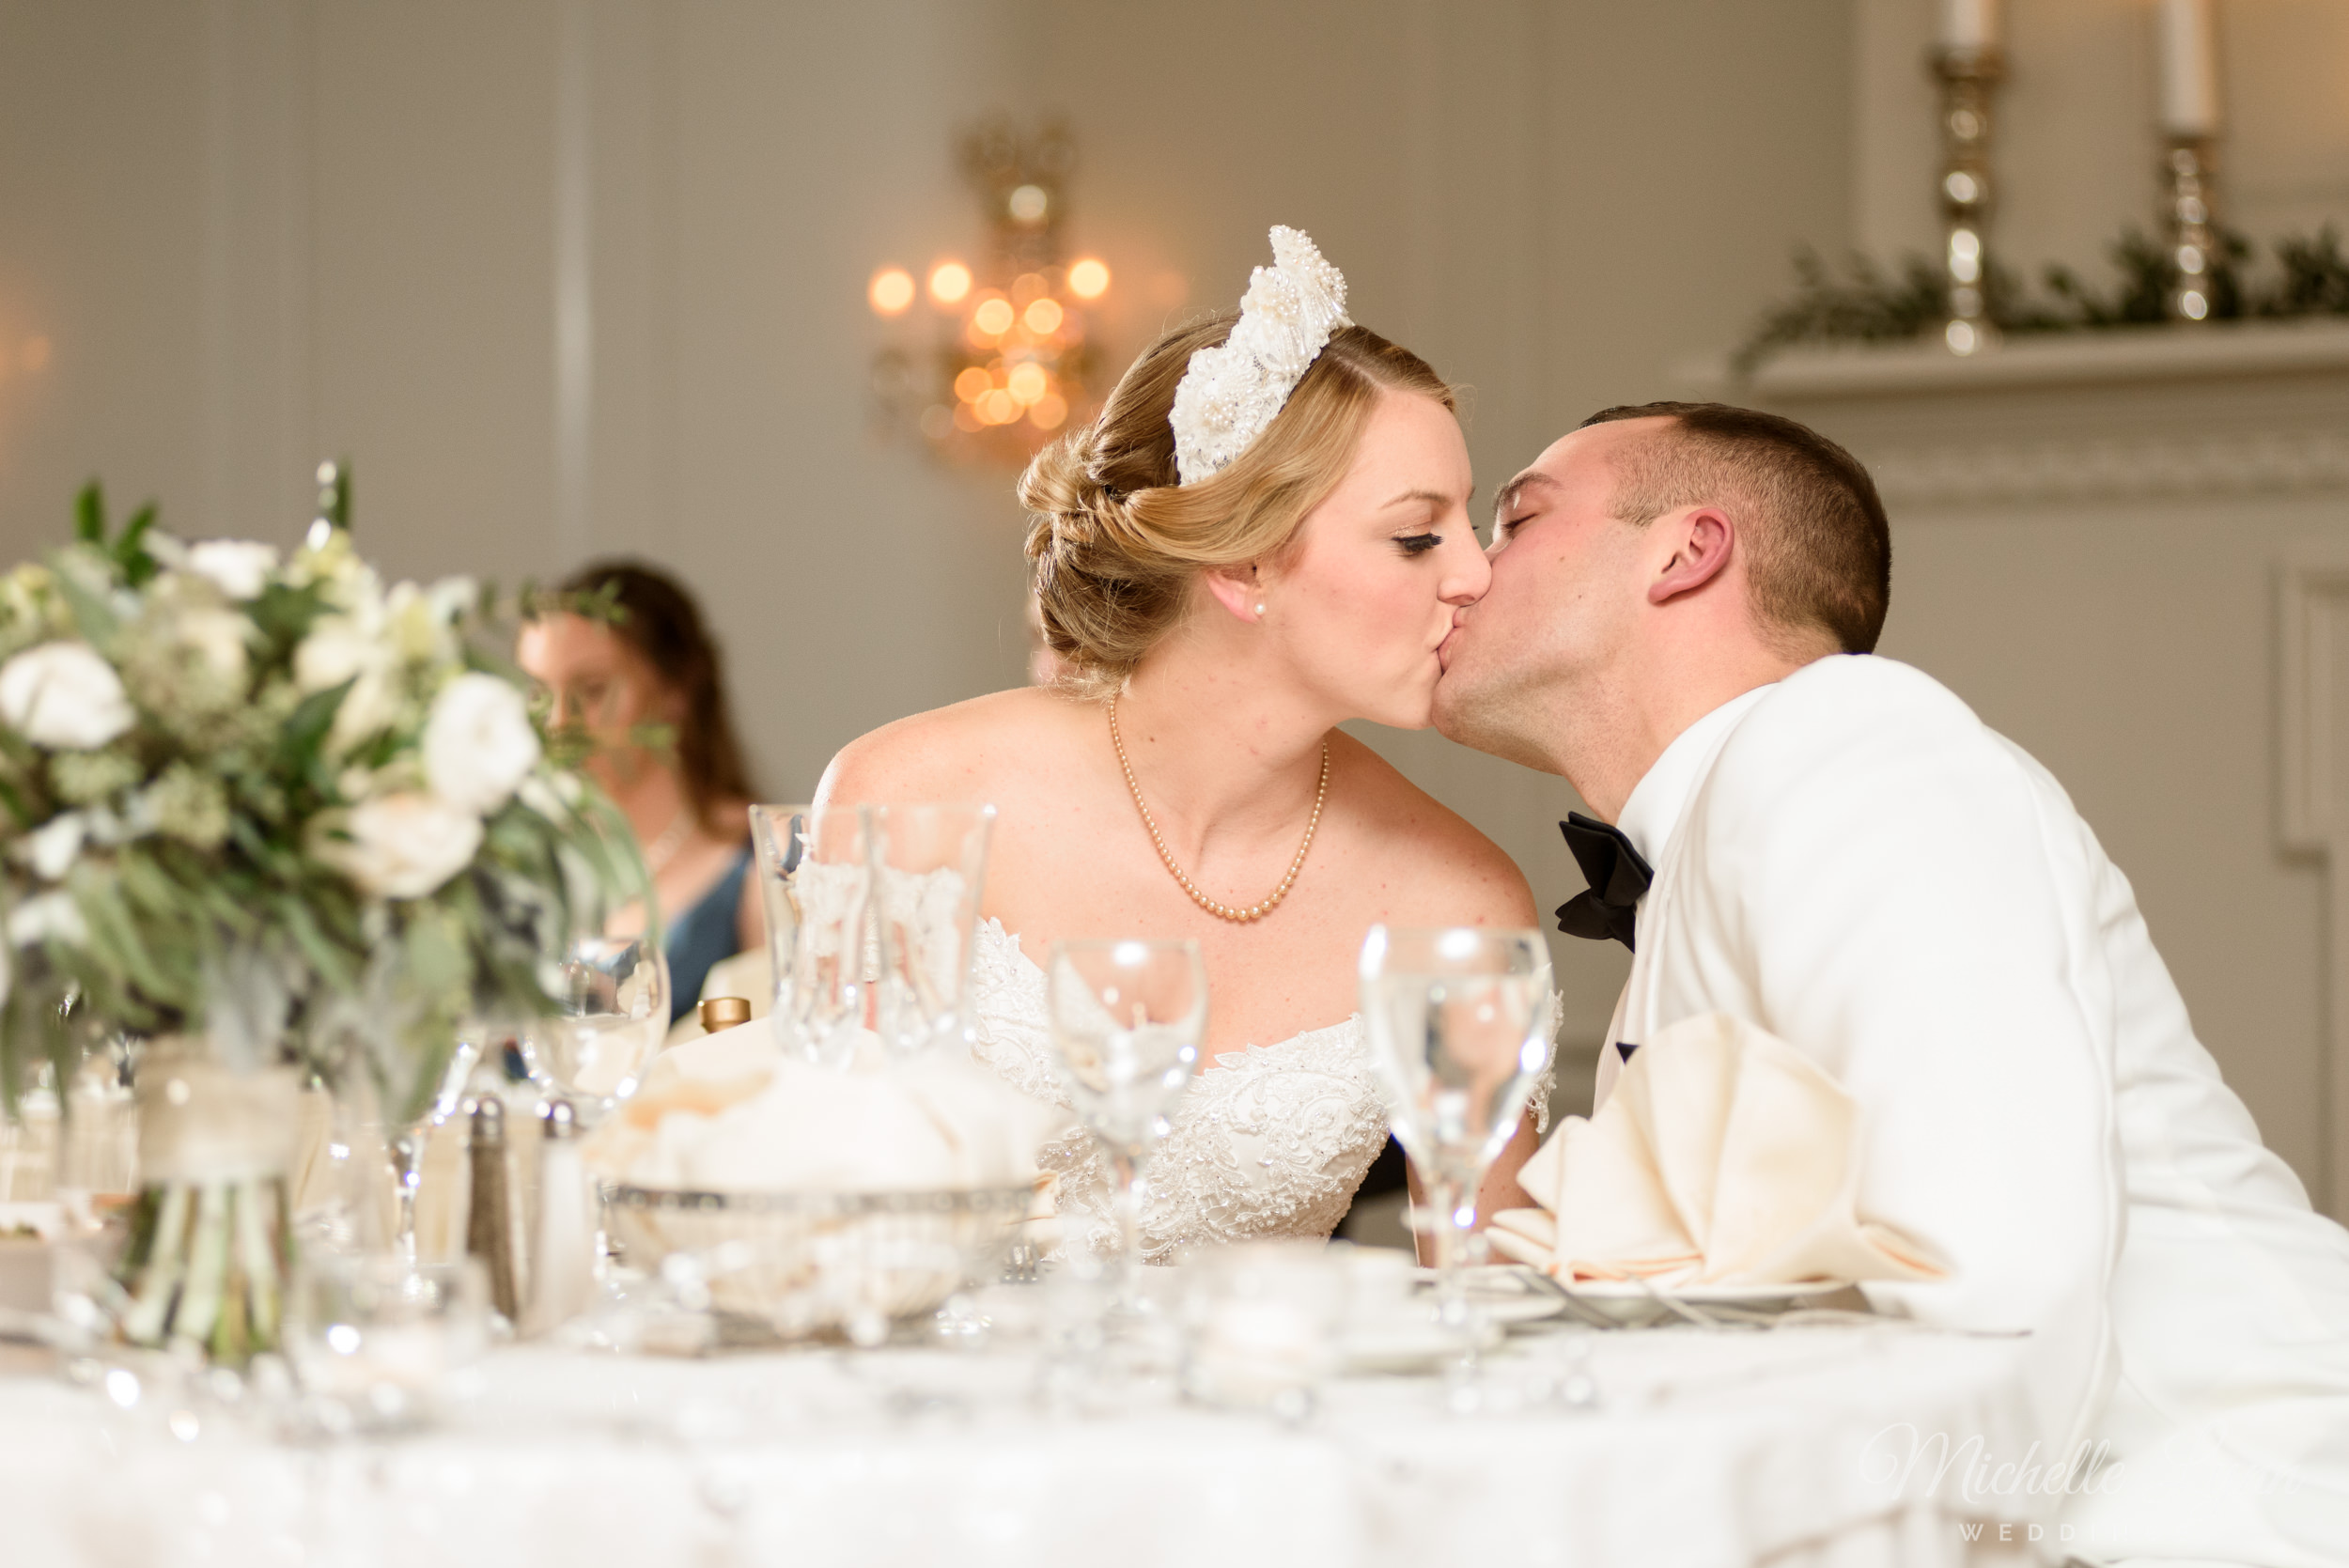 william-penn-inn-wedding-photography-mlw-91.jpg